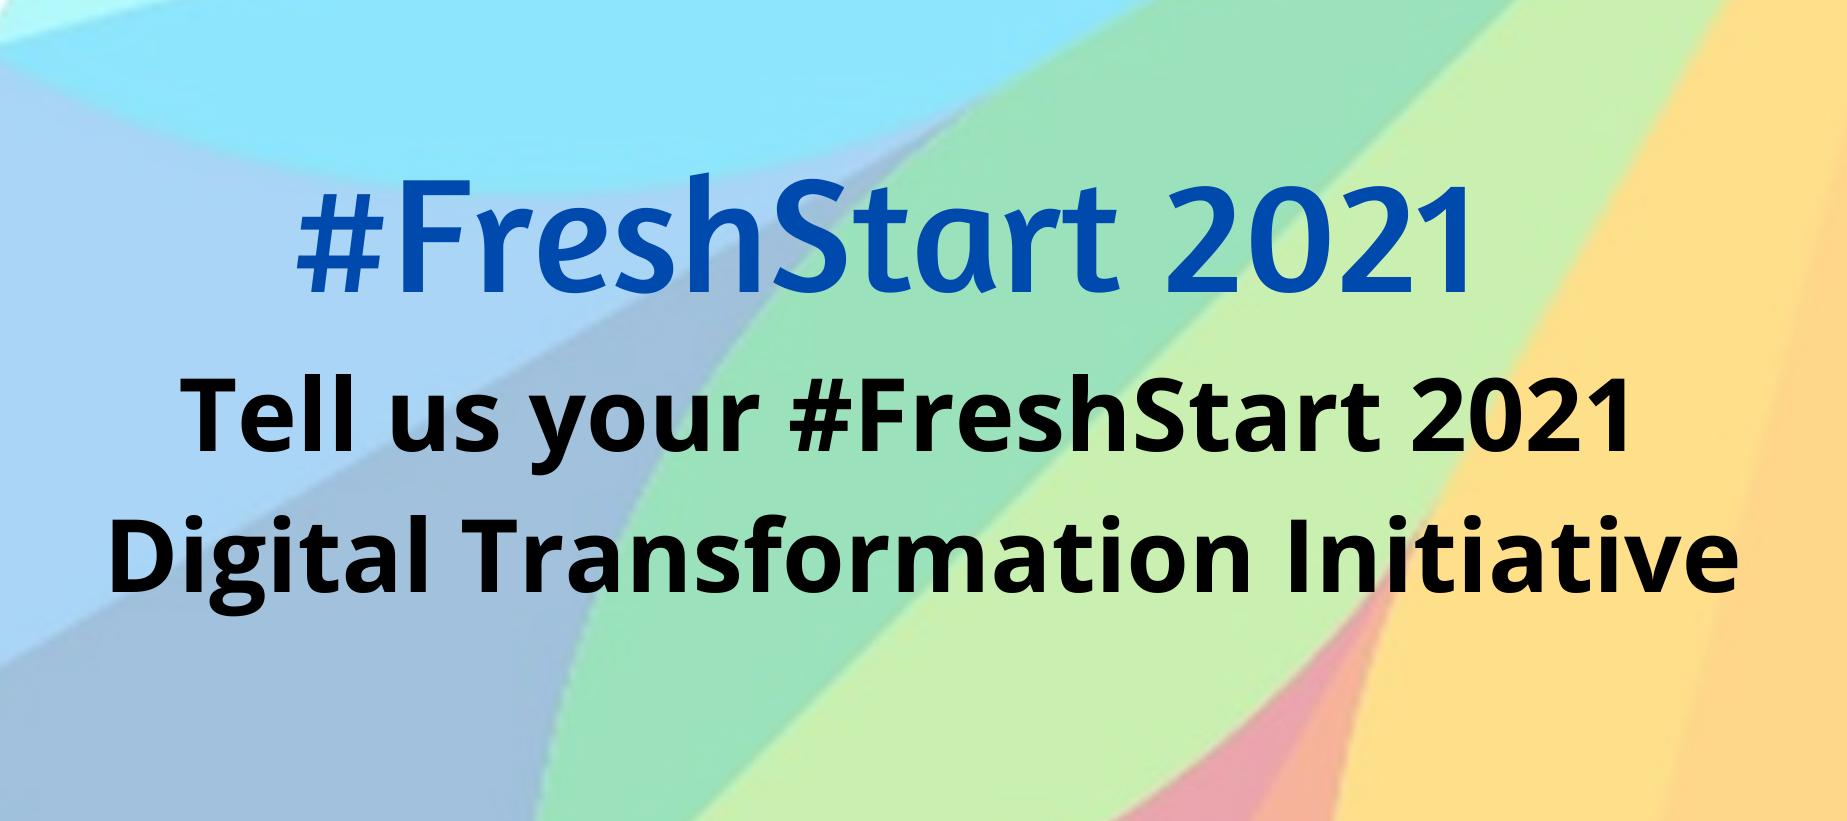 Your #FreshStart 2021  Digital Transformation Initiative